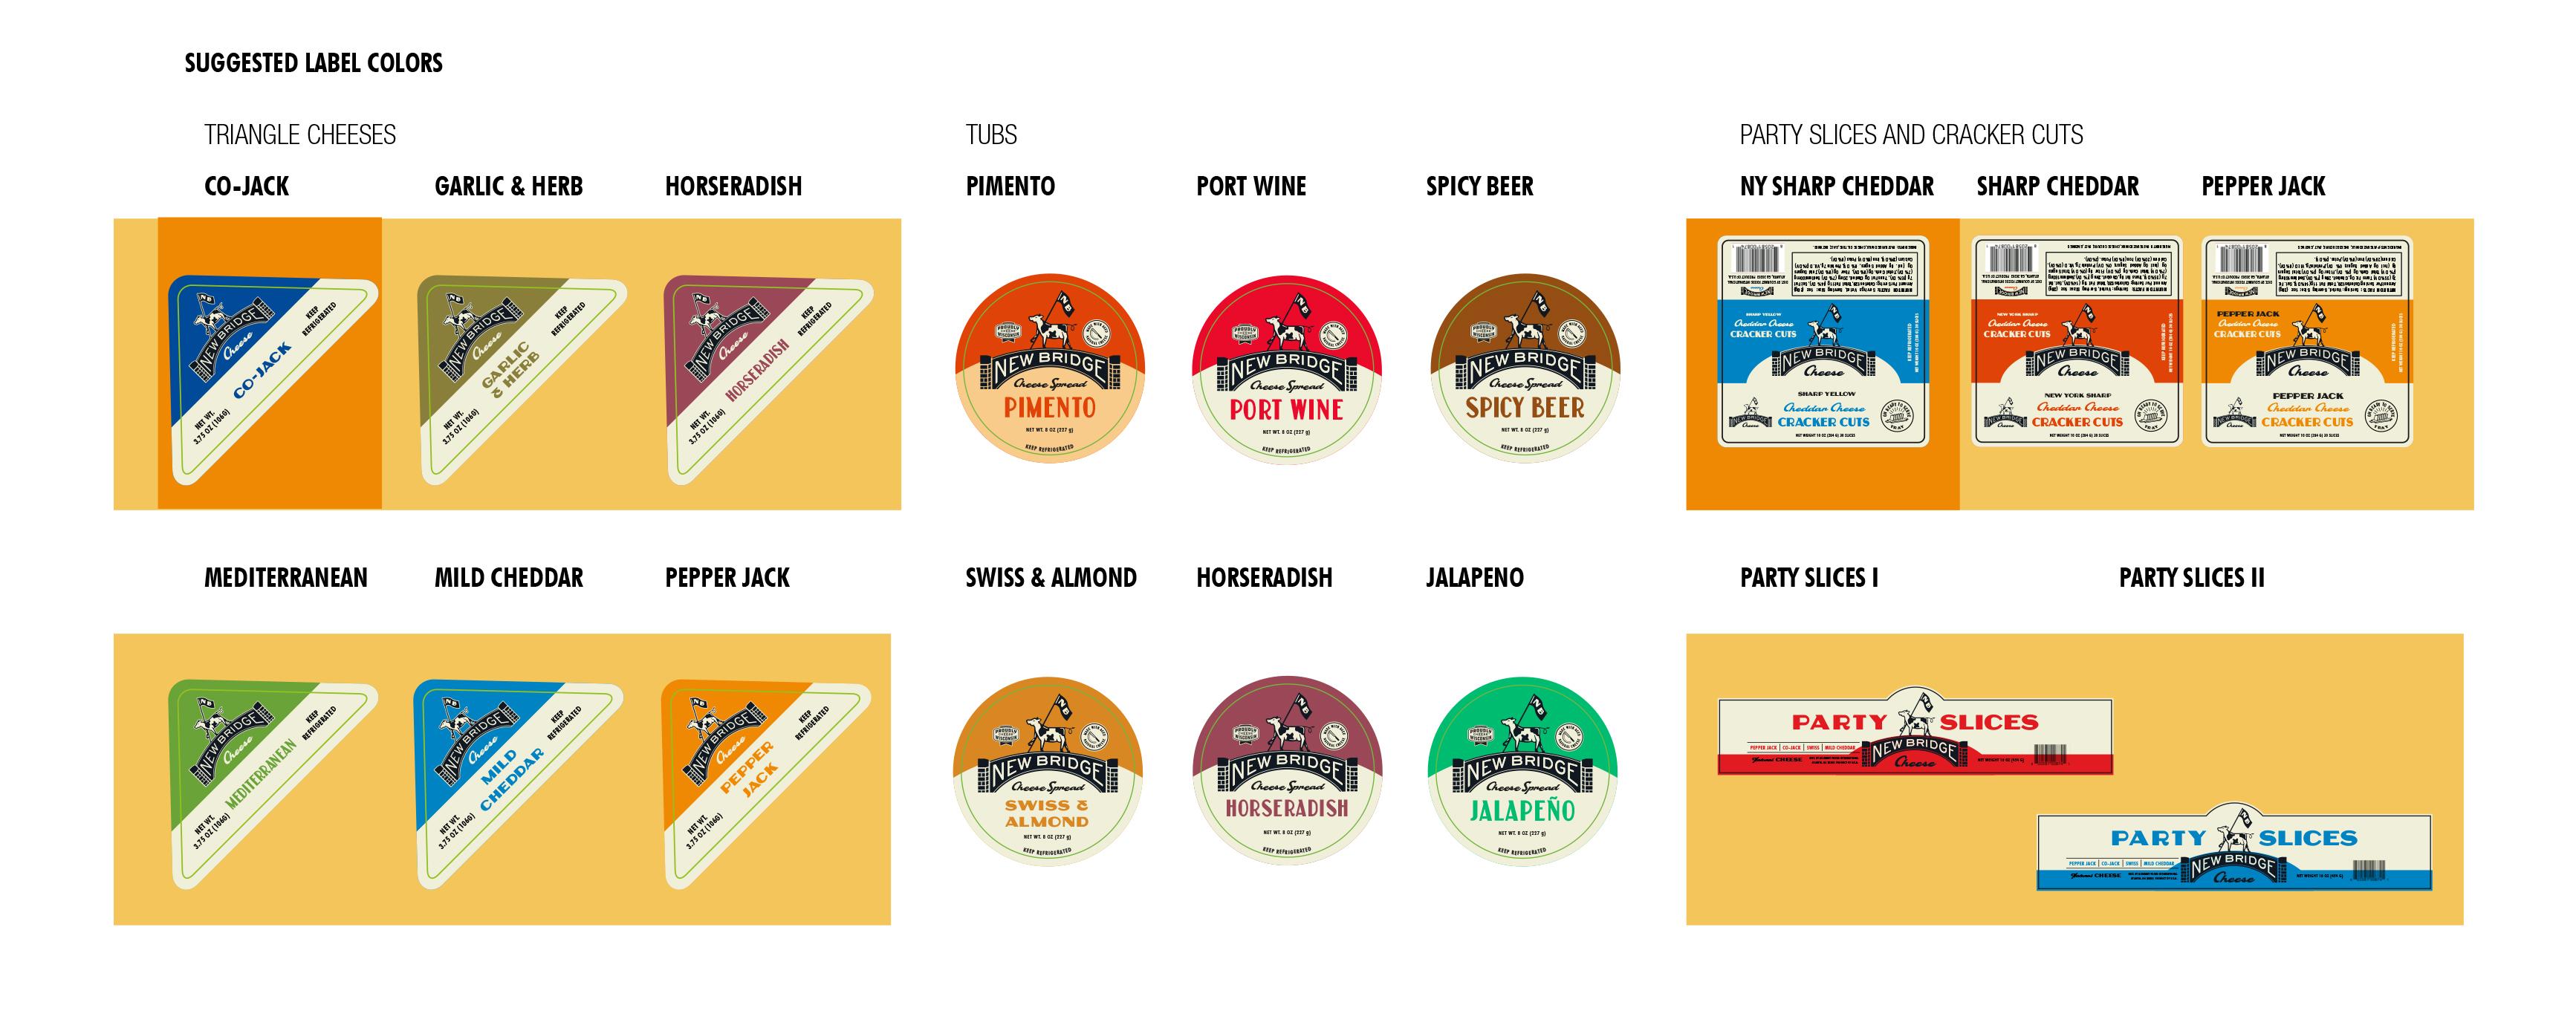 packaging-2-guideline-new-bridge-cheese-design-exploration-zeki-michael-design-cheese-cow-spread-tub-sku-range-agency-branding copy